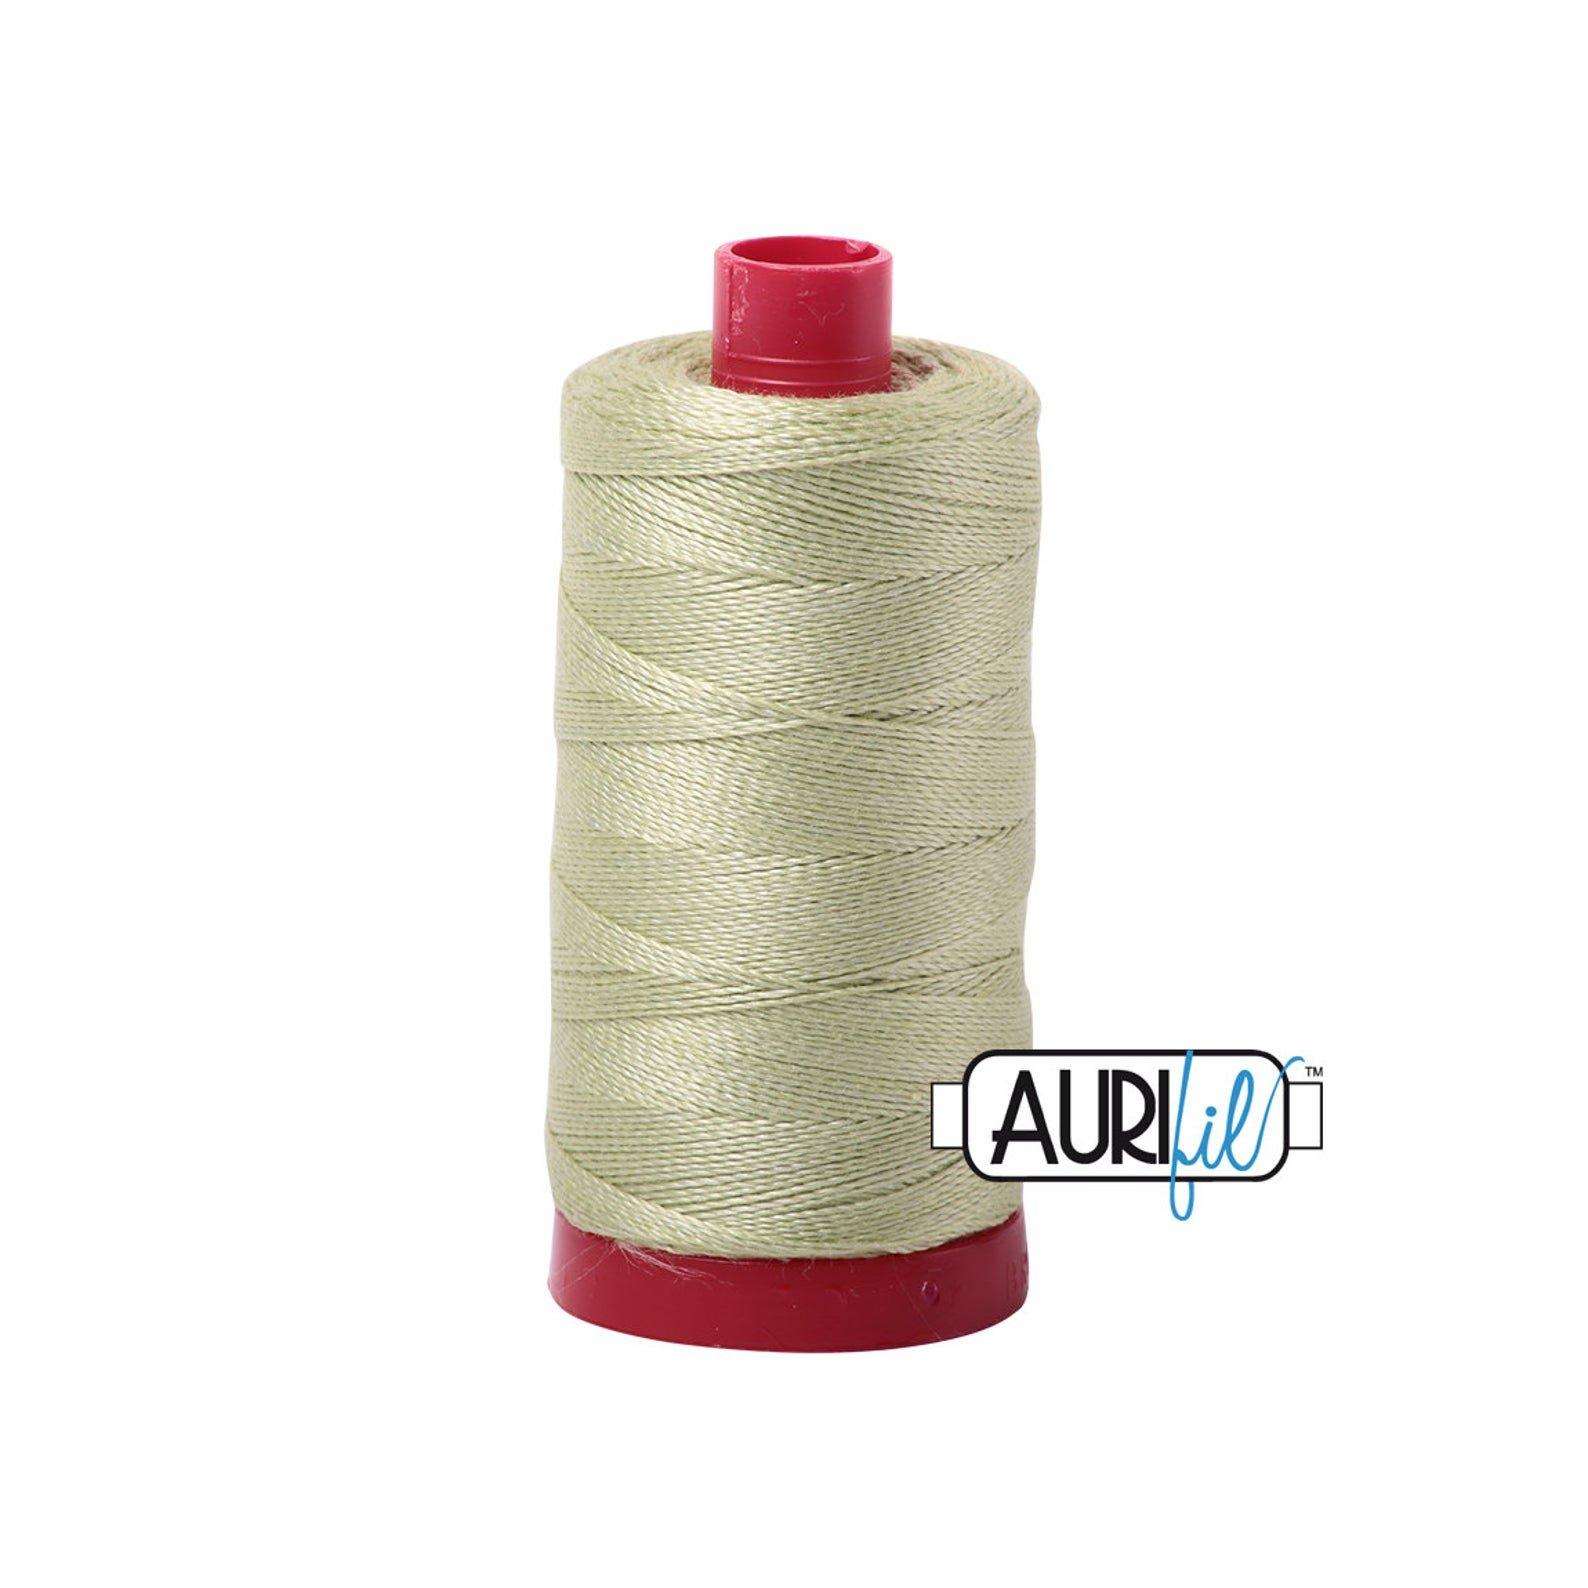 Mako Cotton Embroidery Thread 12wt 356yds Light Avacado